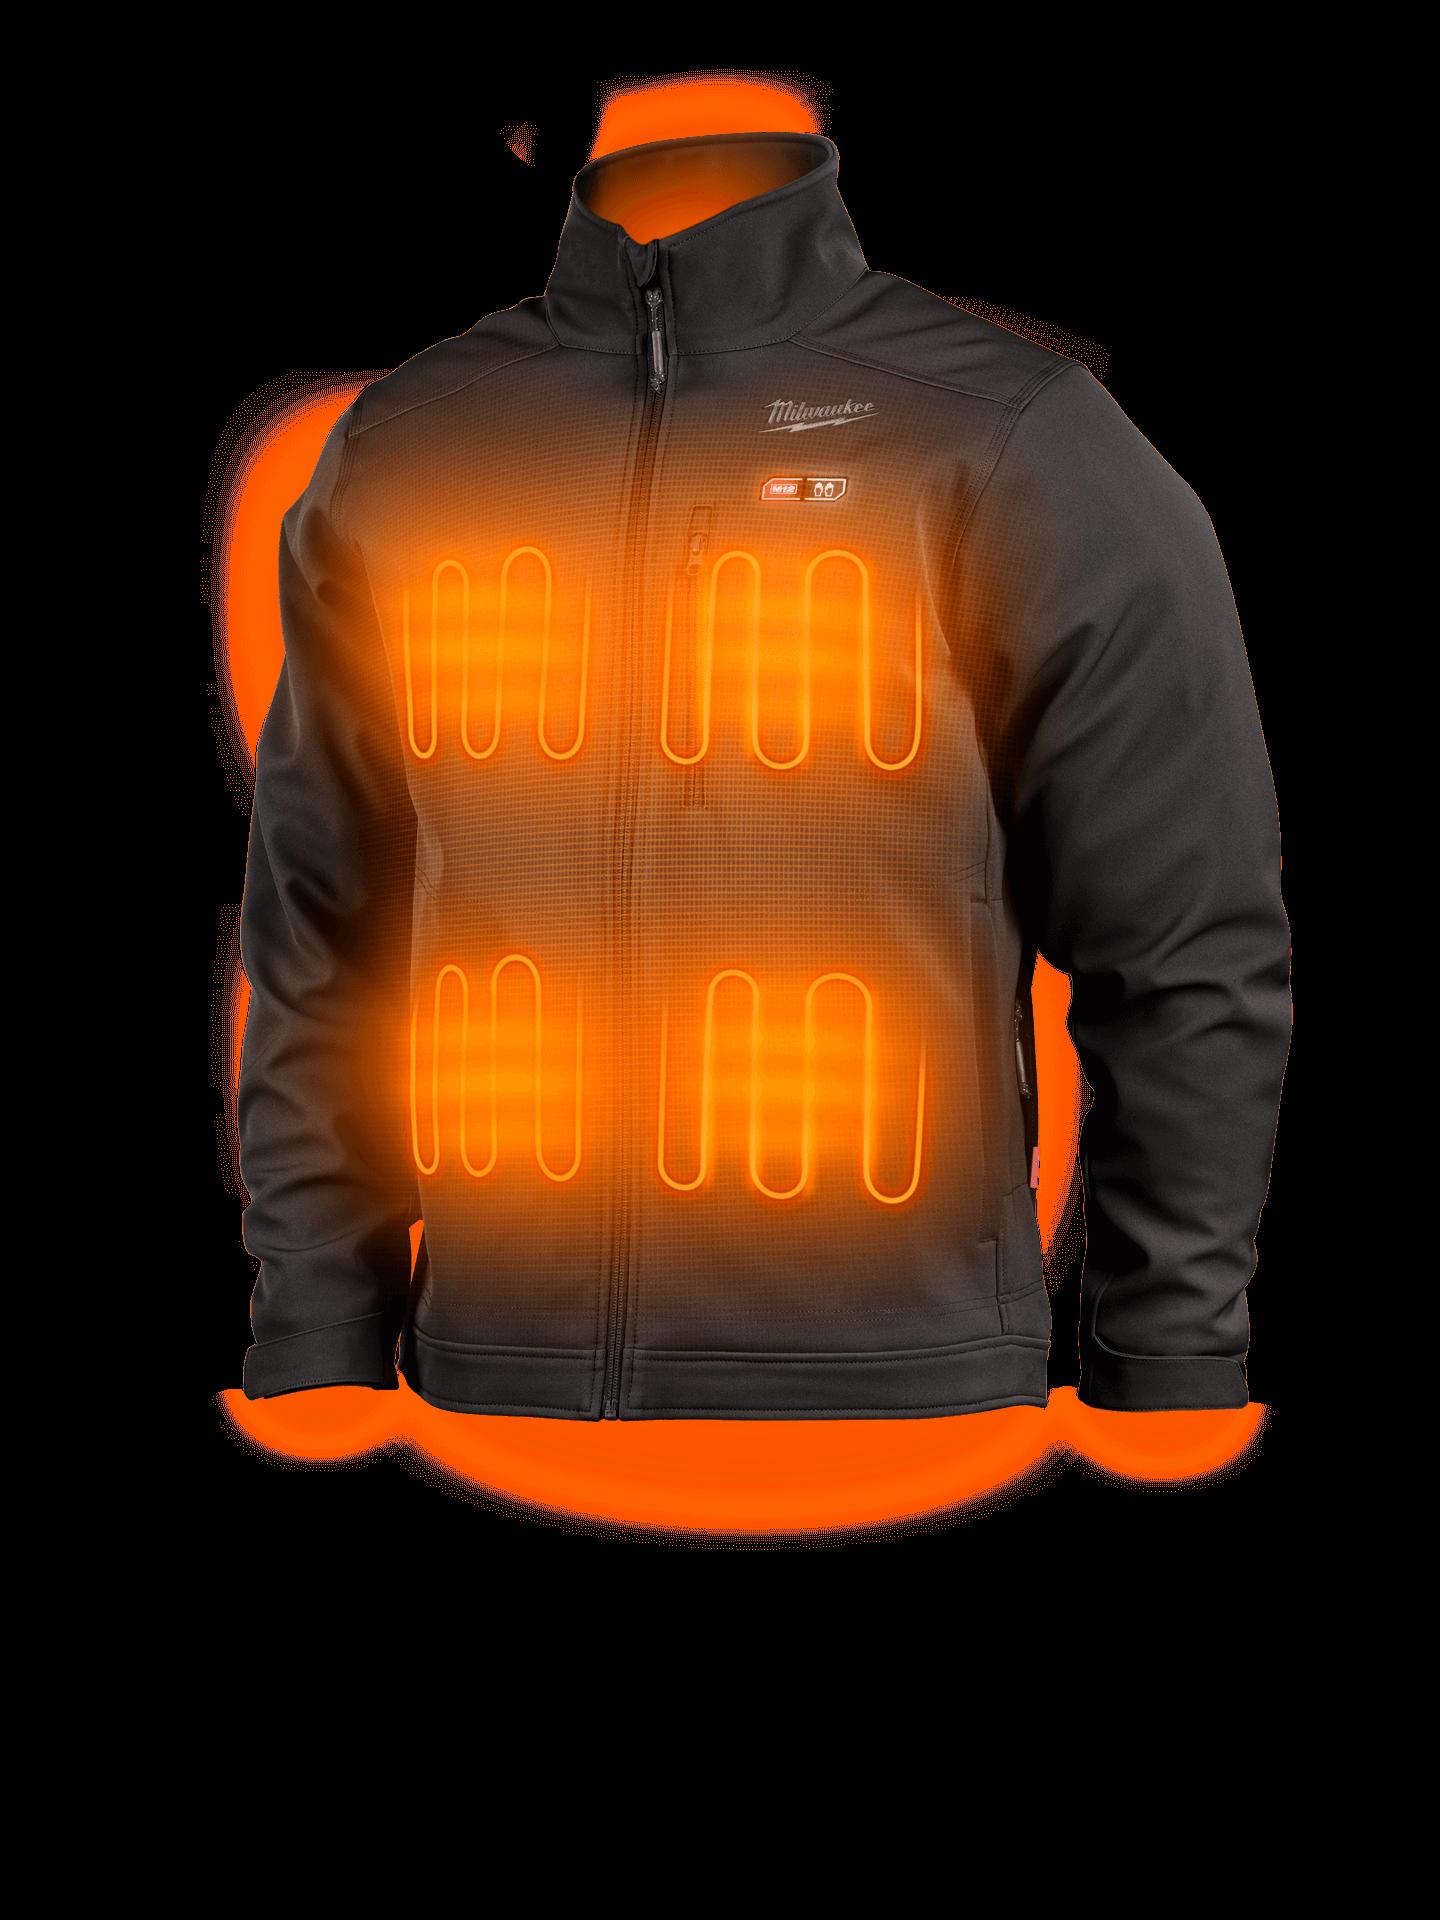 Jachetă încălzită M12™ TOUGHSHELL™